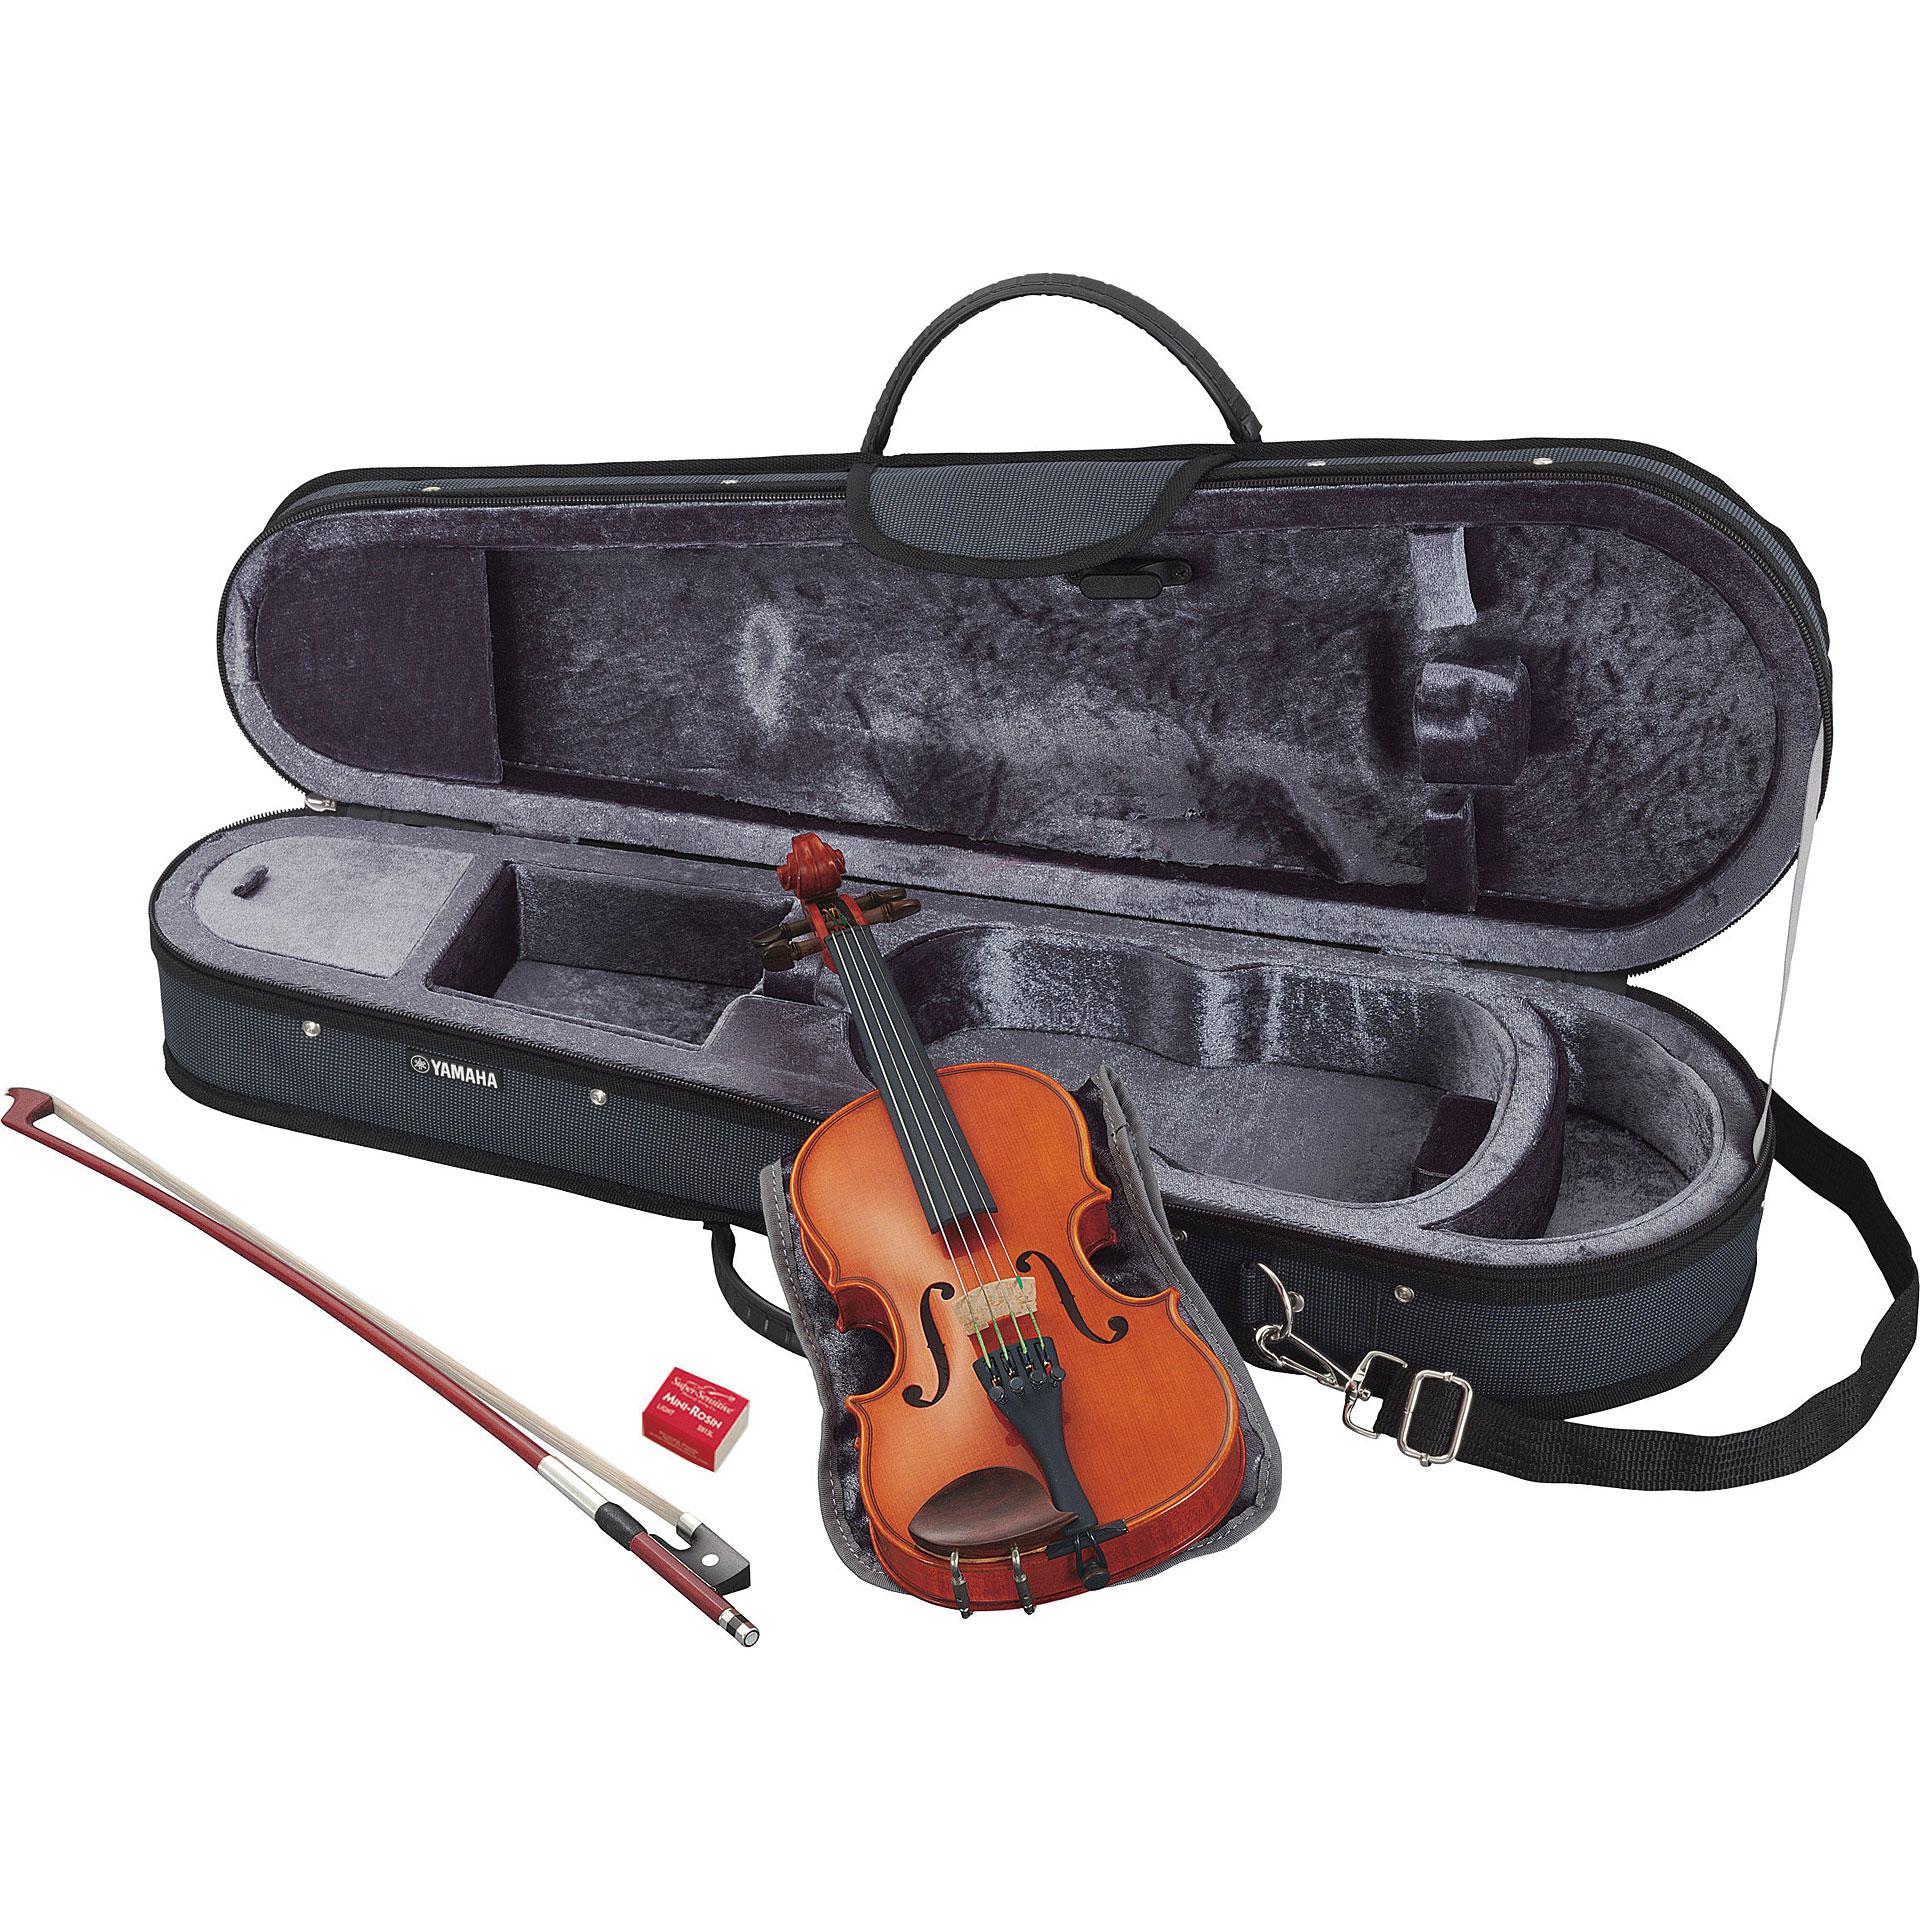 Yamaha v5 3 4 violin for Yamaha vc5 cello review